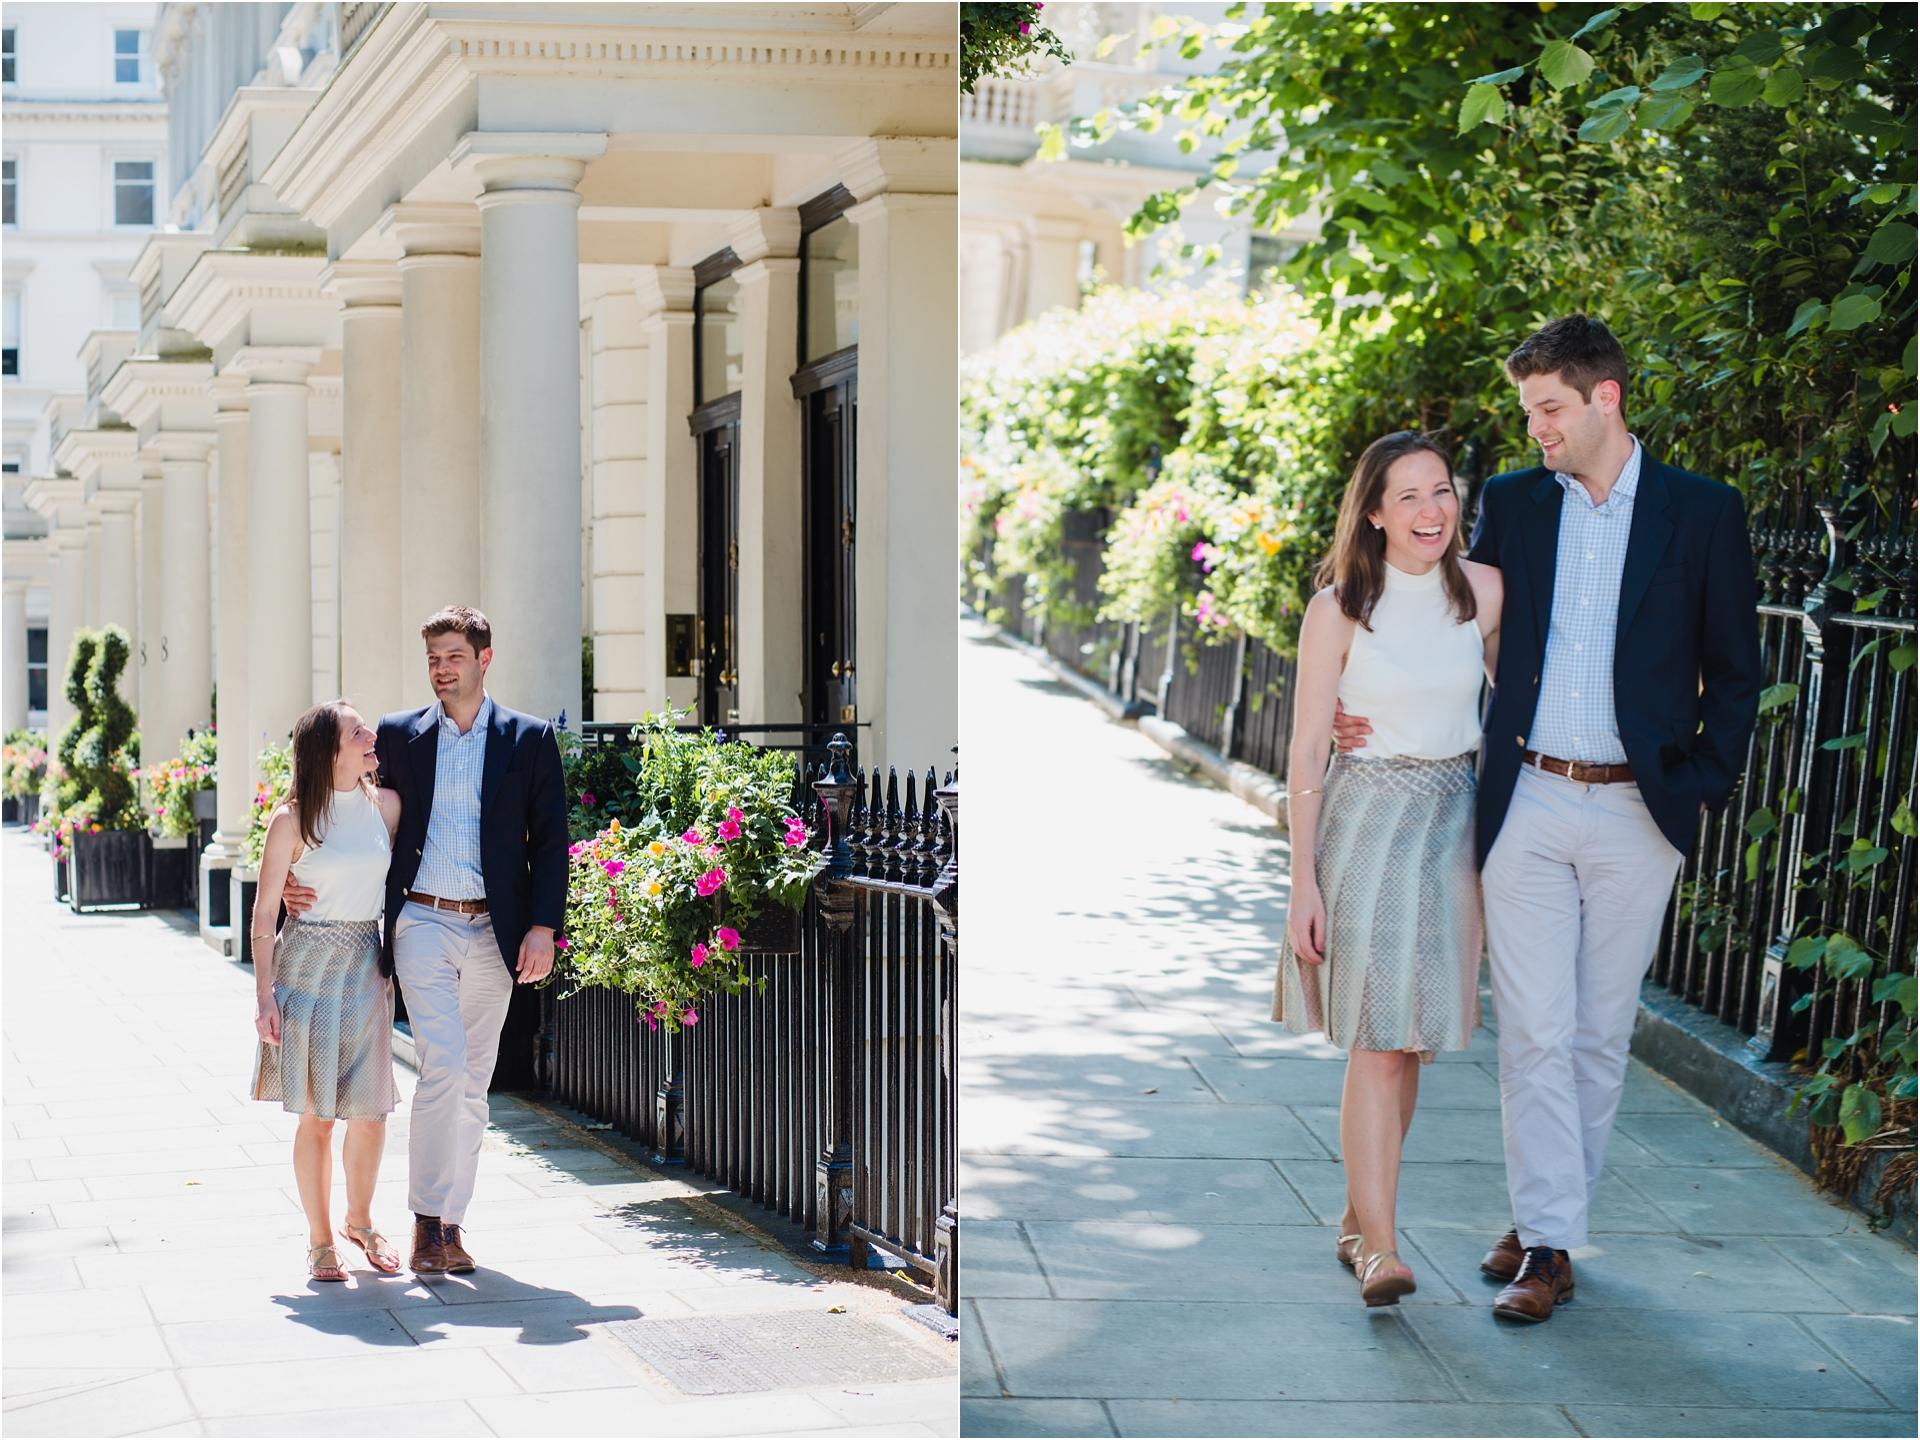 London city engagement session